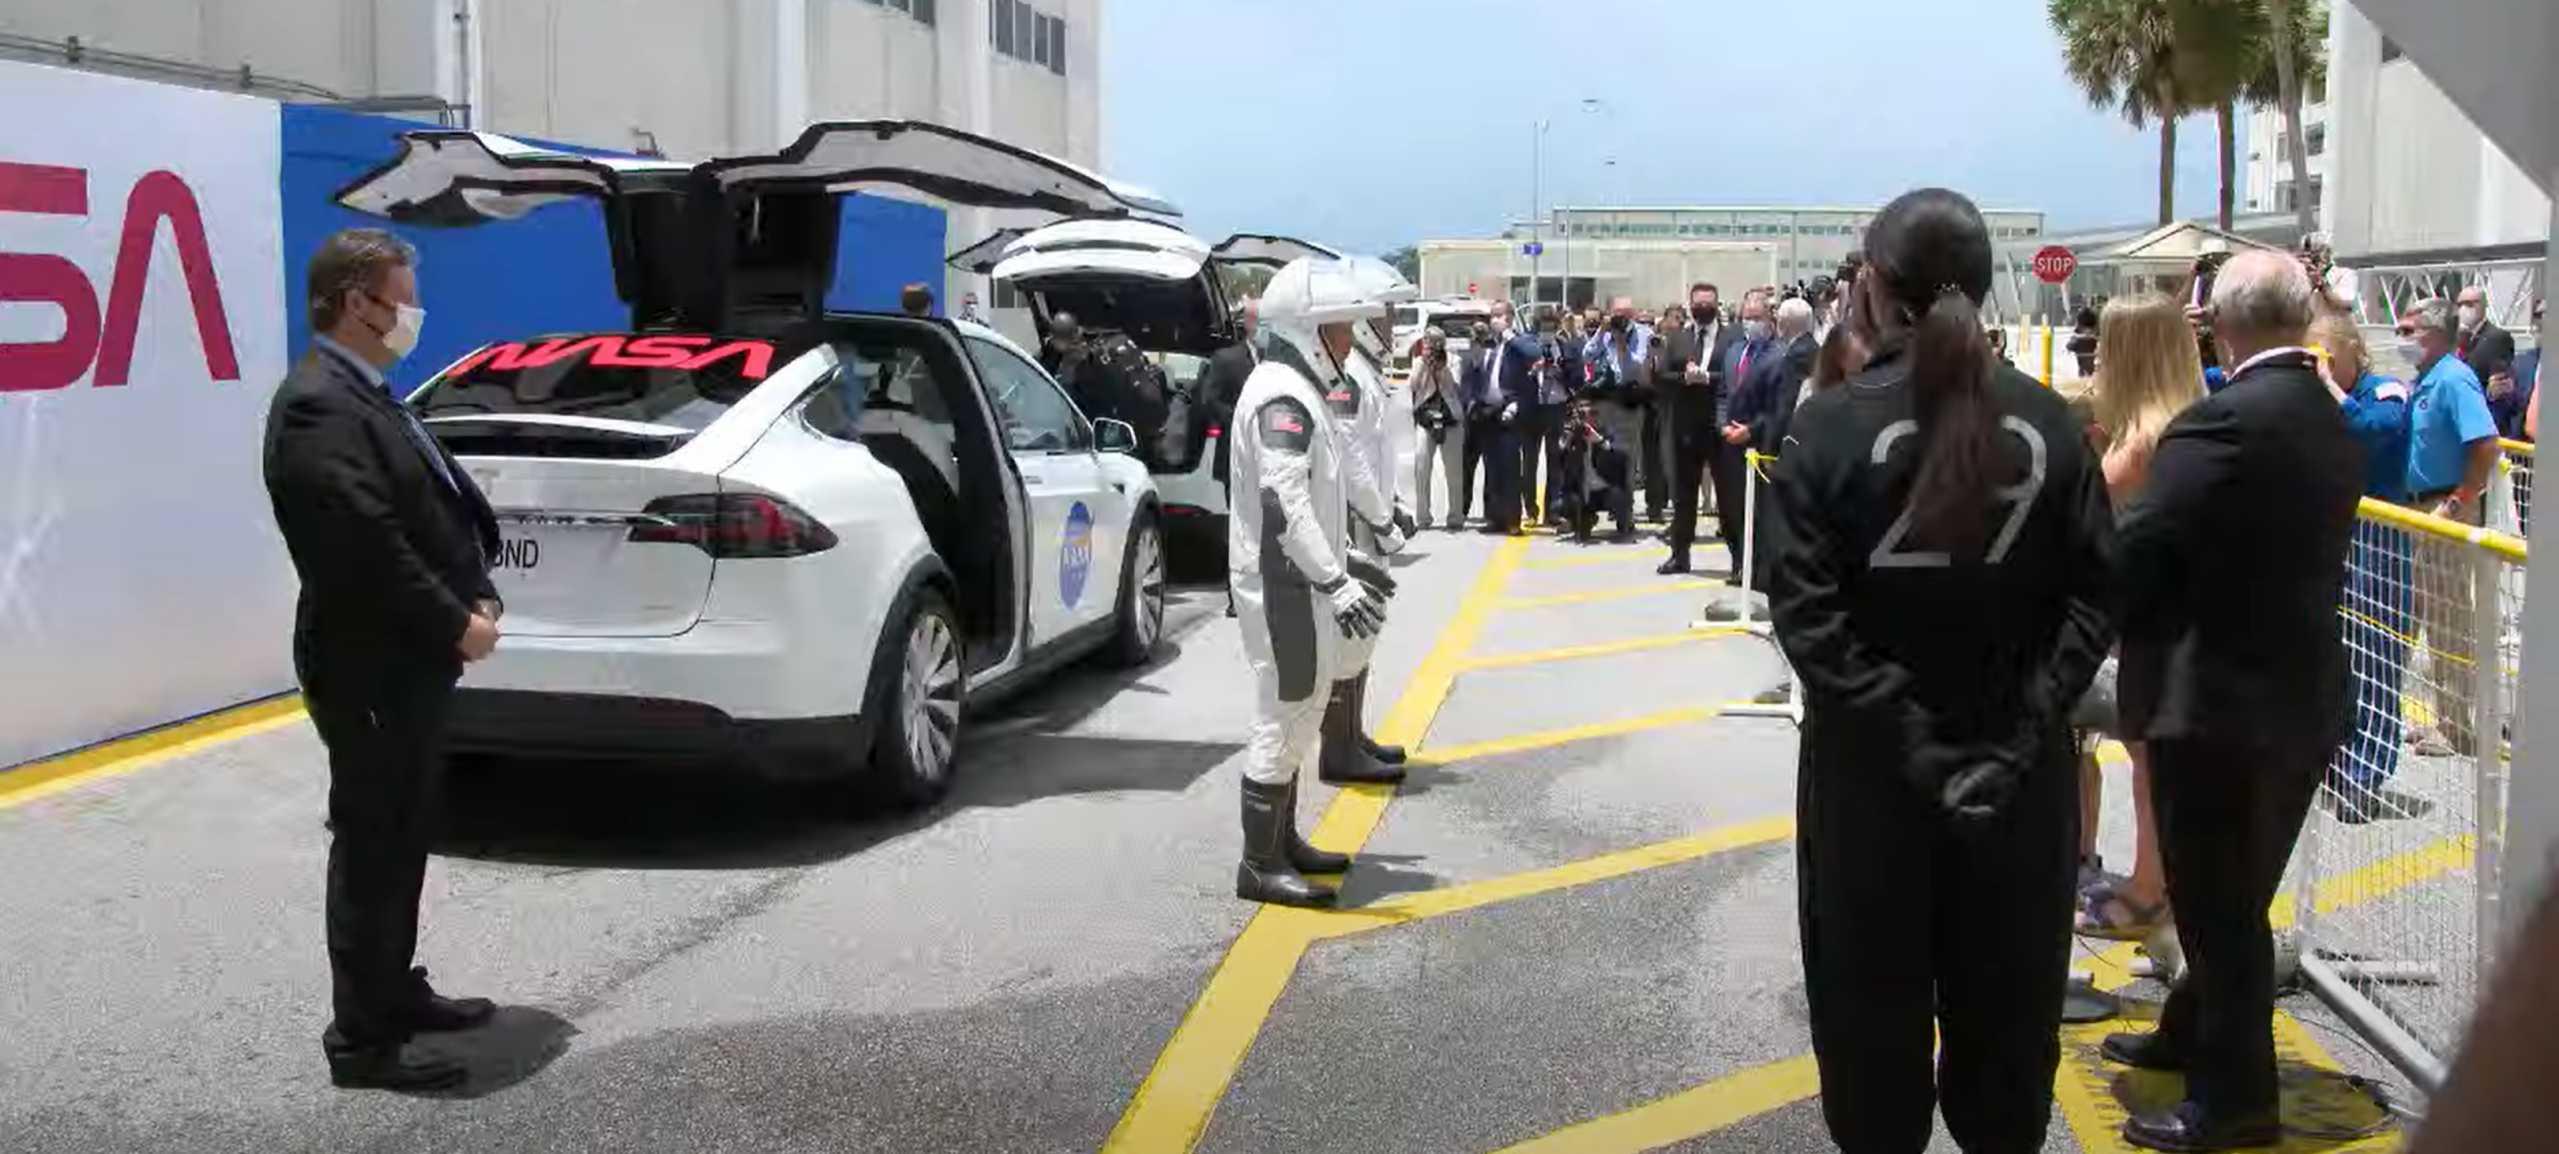 Crew Dragon C206 F9 B1058 Demo-2 052720 webcast (SpaceX) Doug Bob Tesla ingress 1 (c)